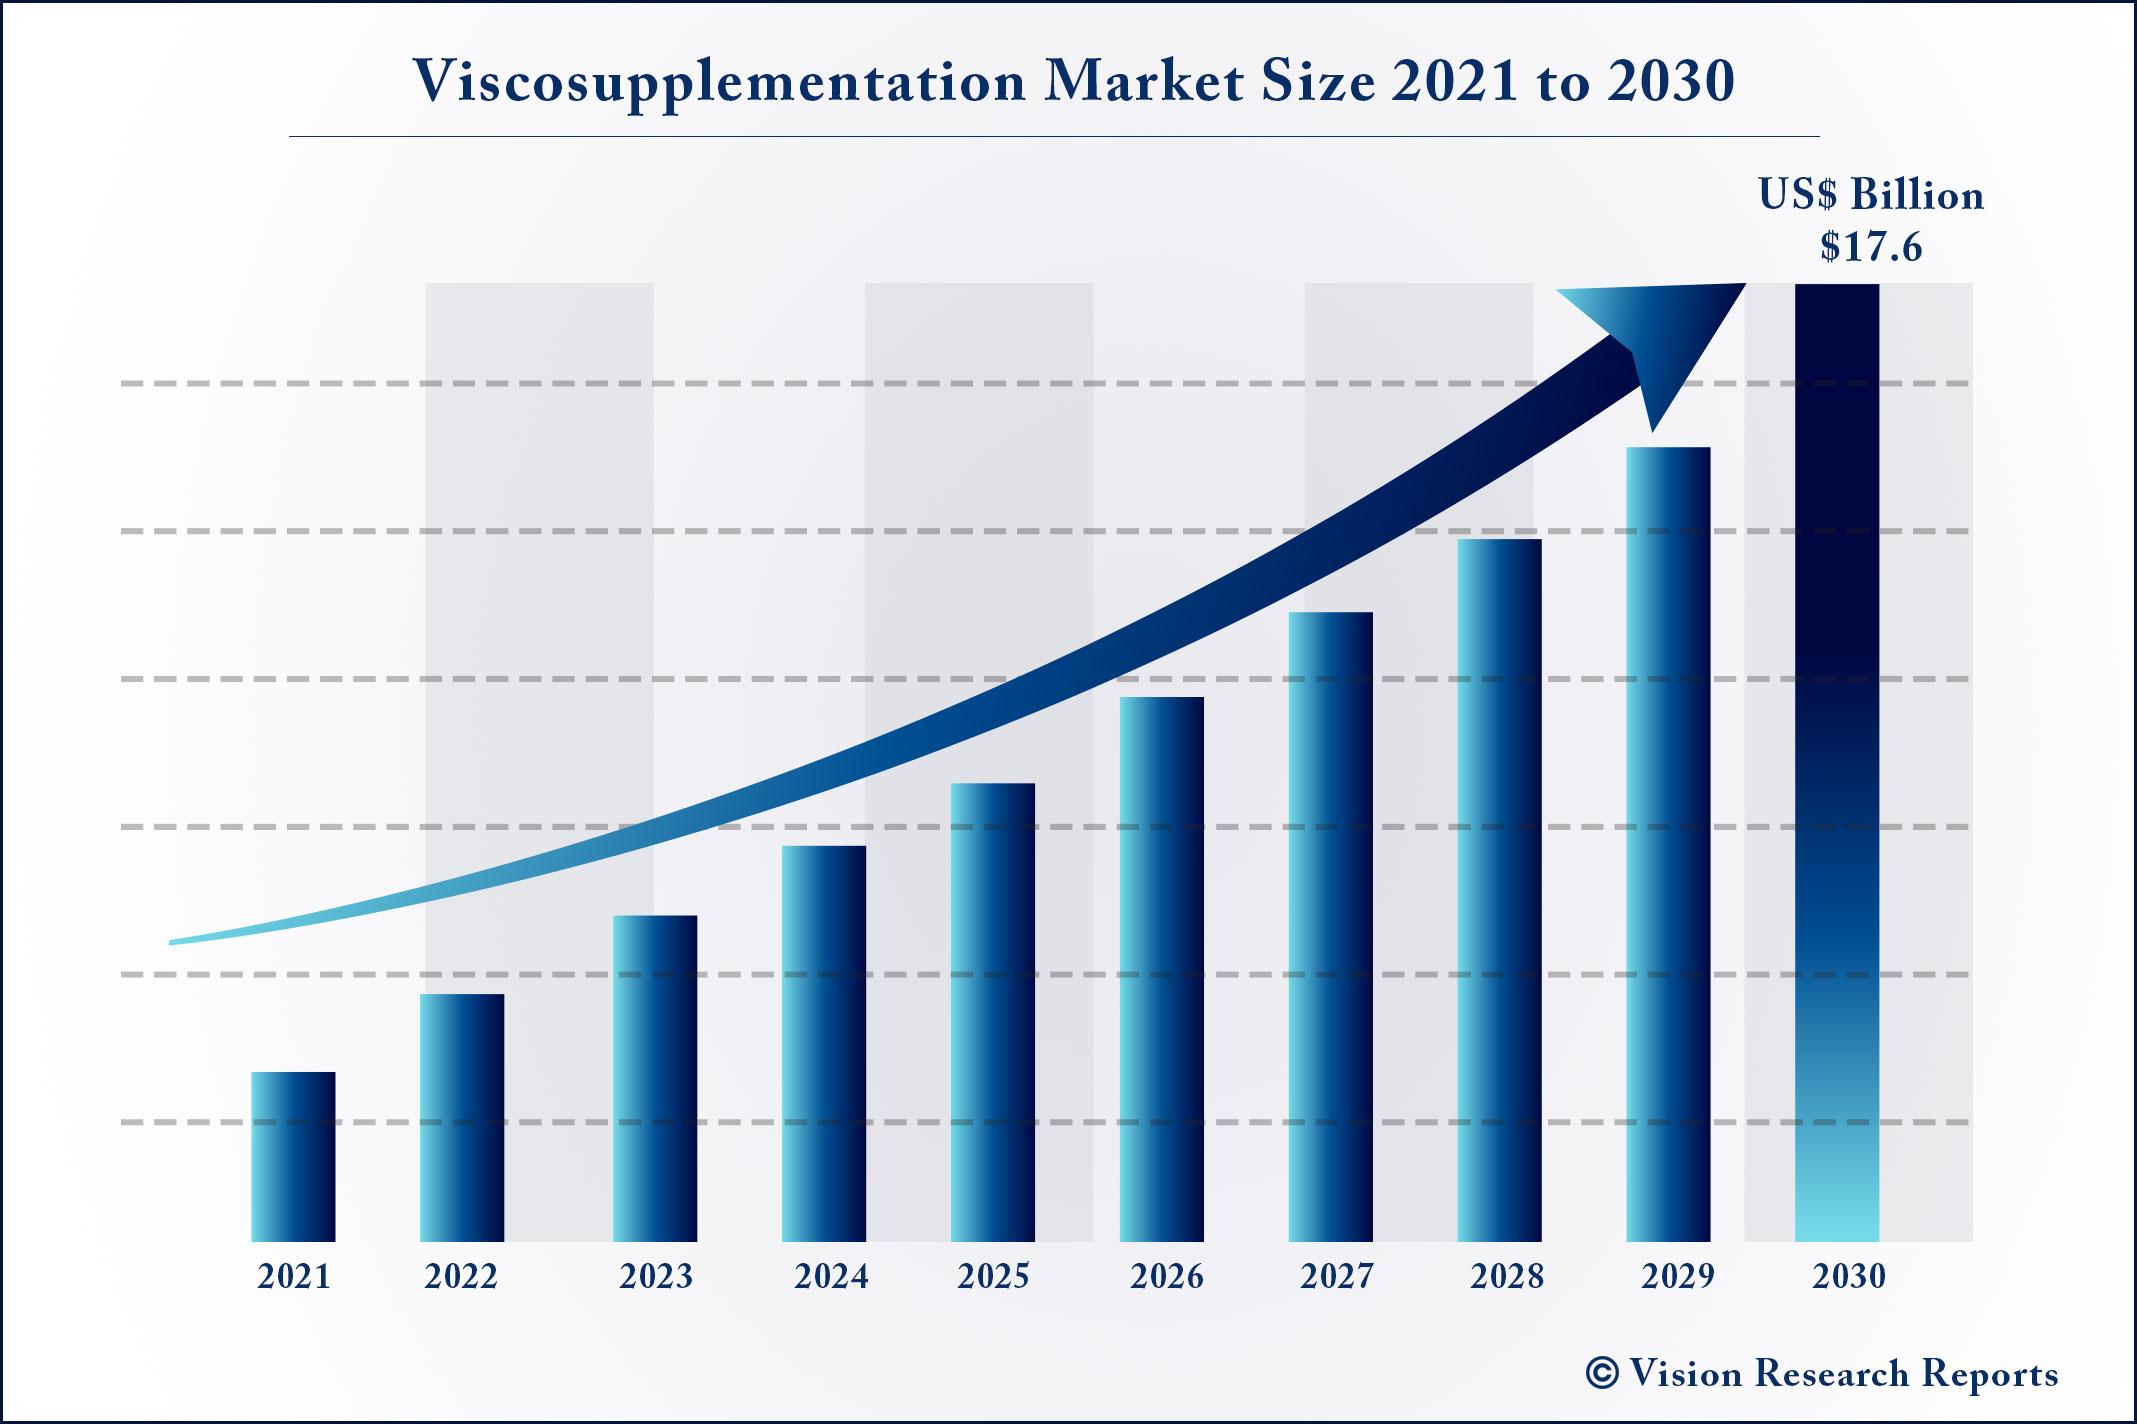 Viscosupplementation Market Size 2021 to 2030